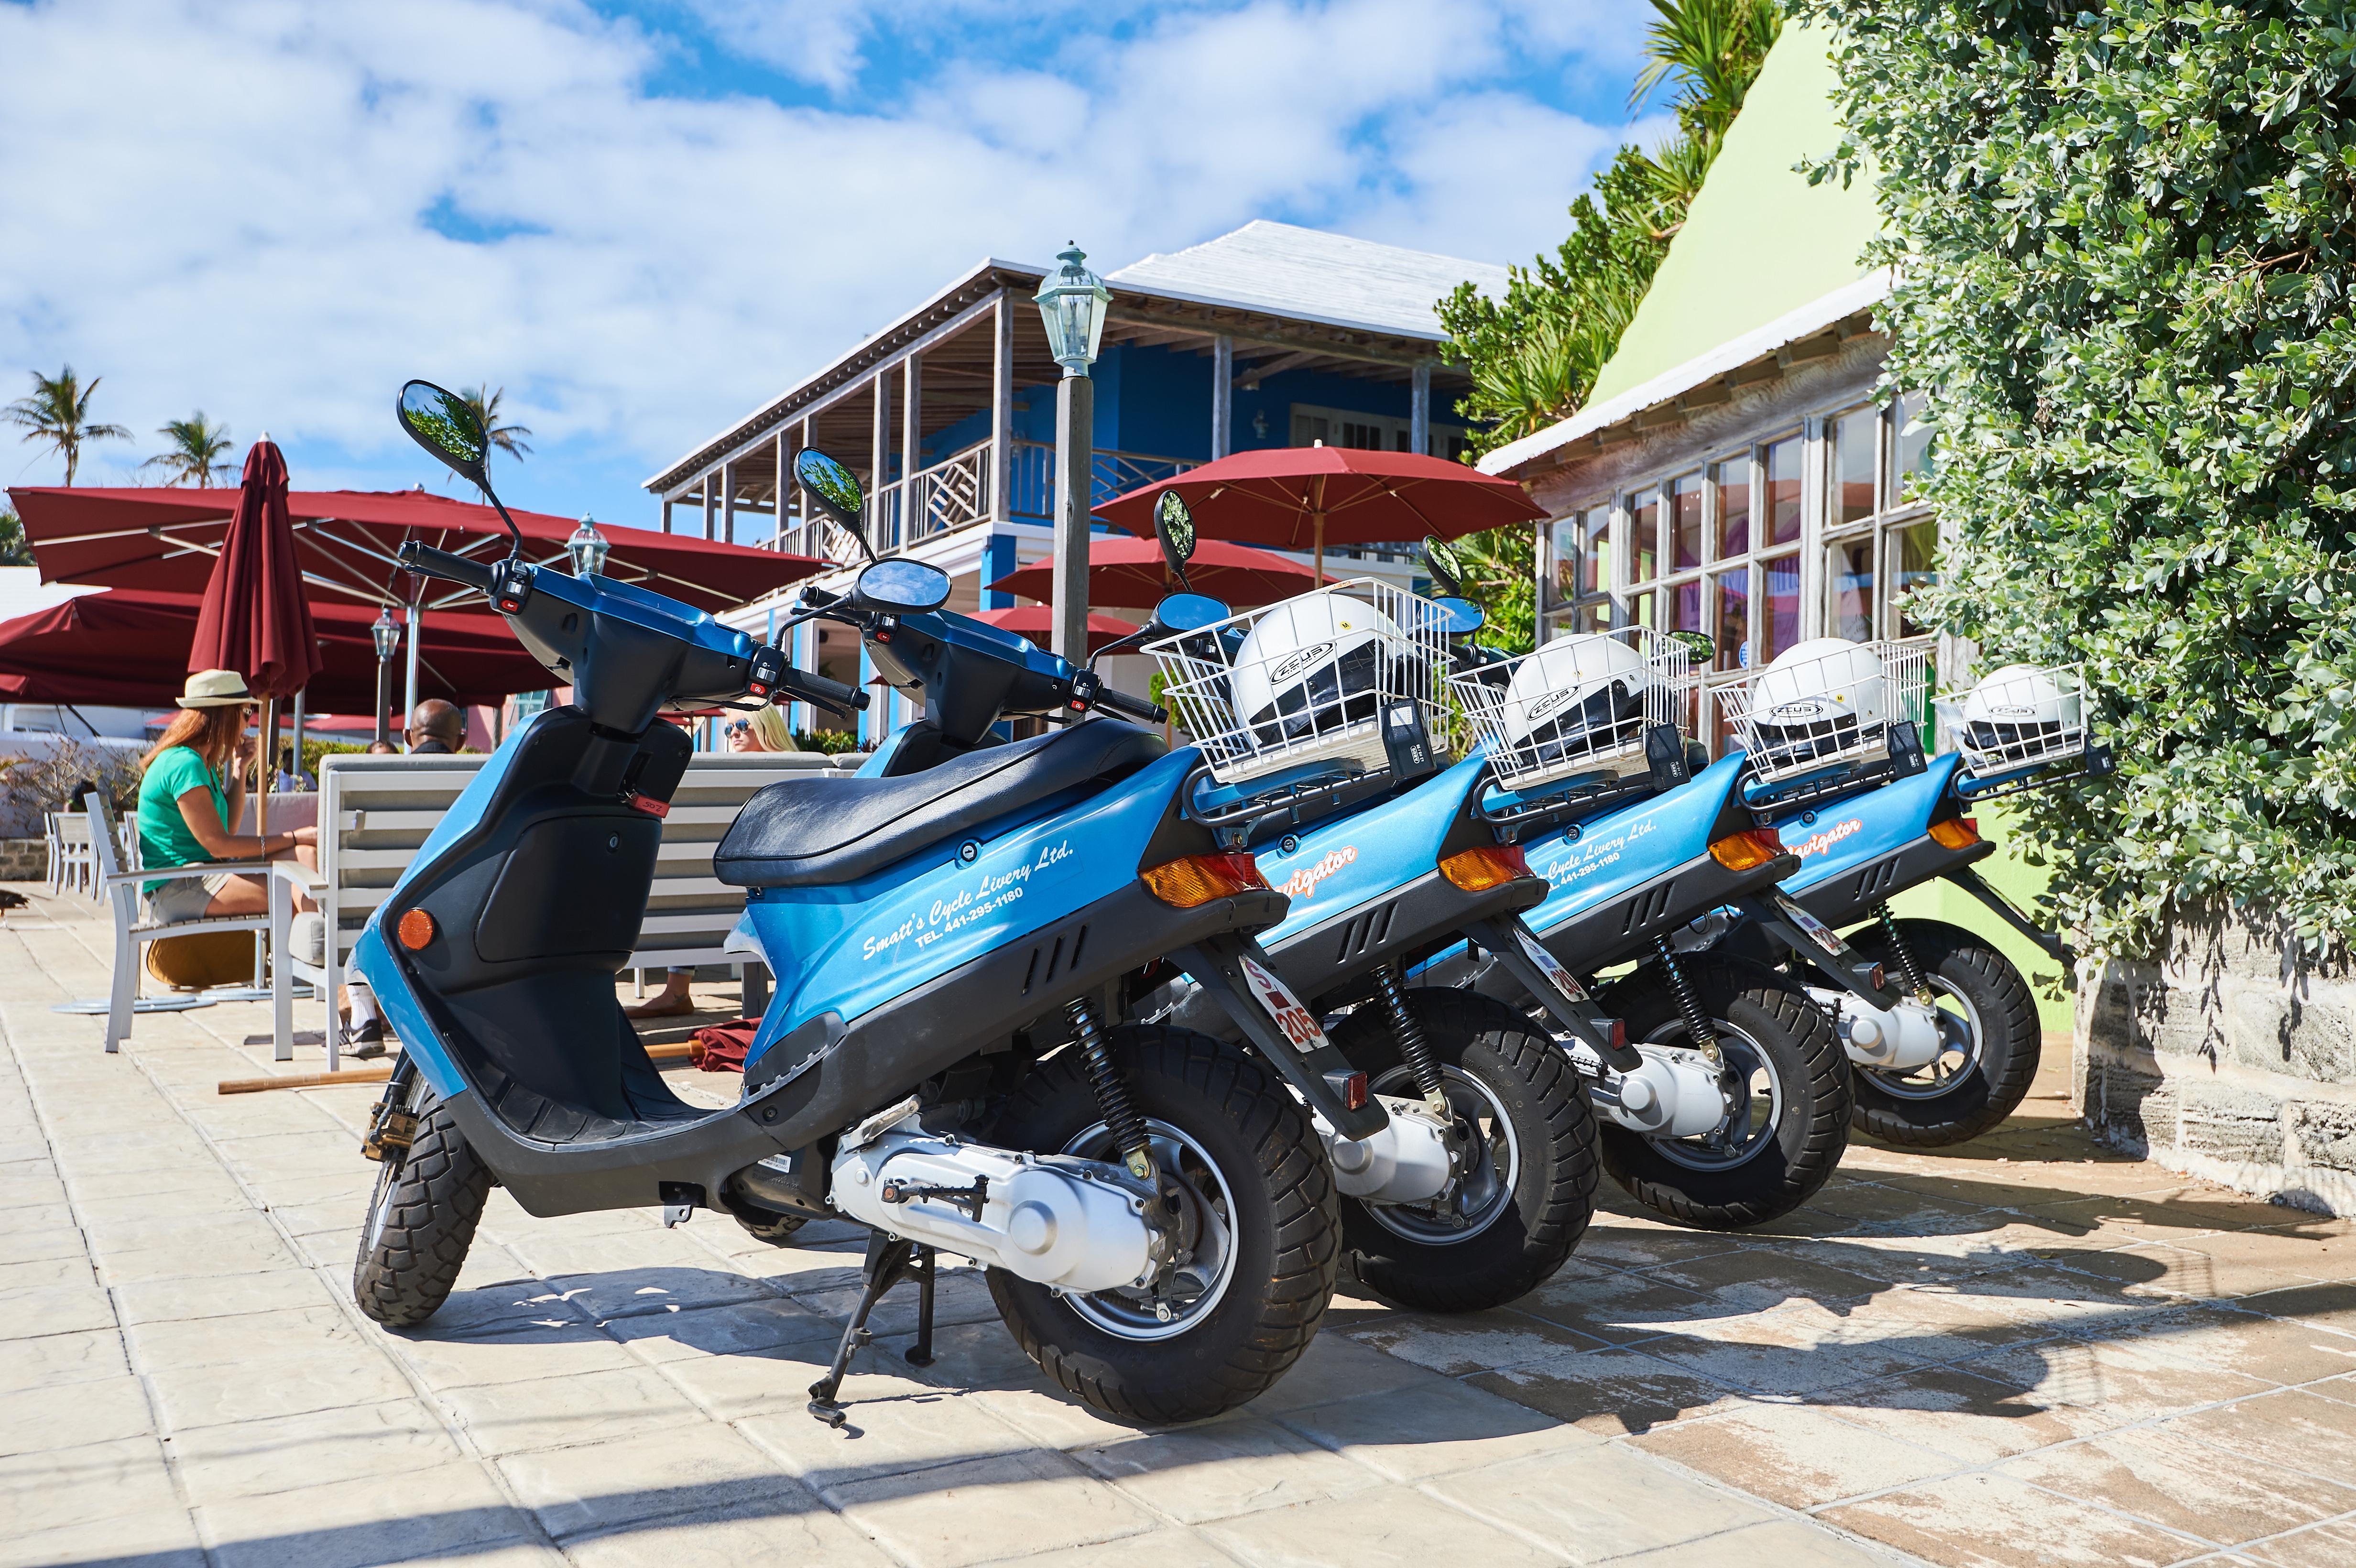 Smatts Cycle Livery Bermuda Scooter Rental 1960s Honda 50cc Bike Show More